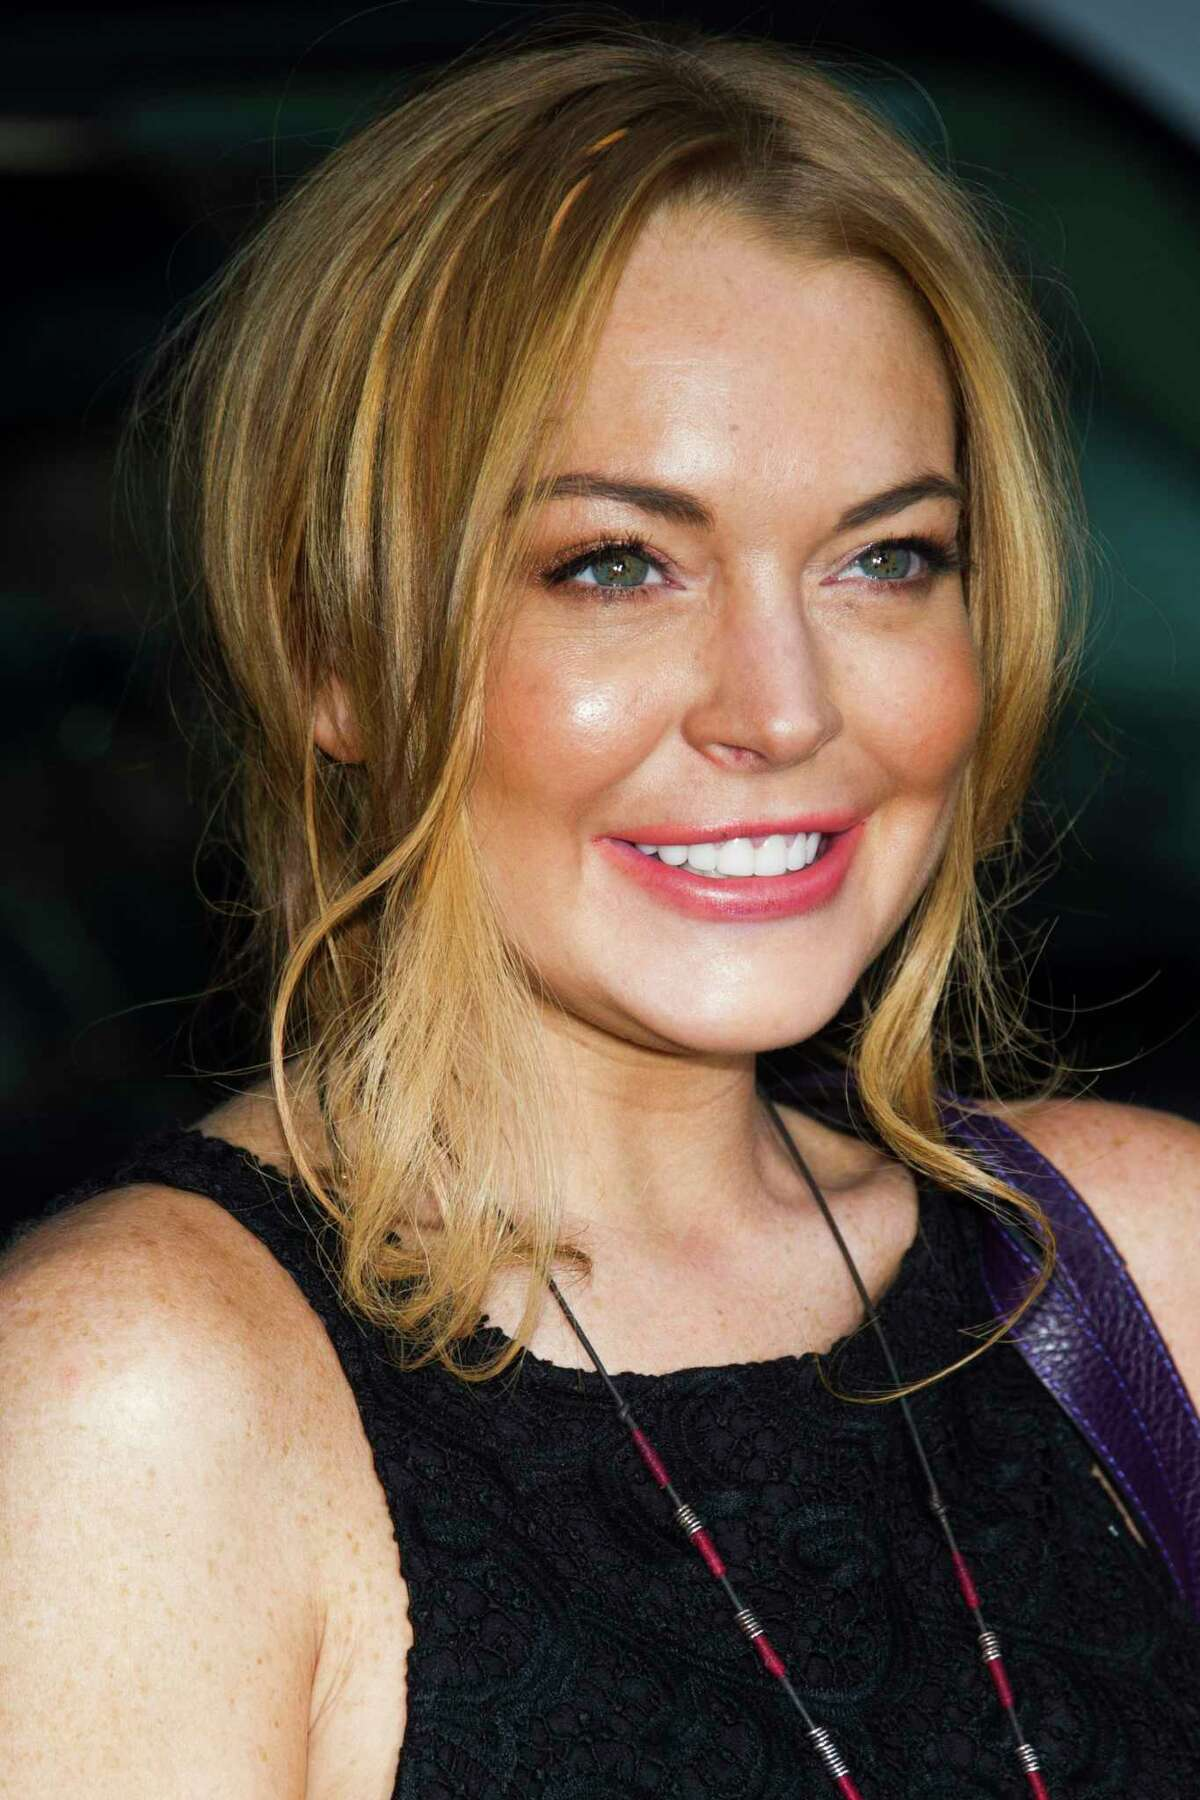 Lindsay Lohan leaves an appearance on the